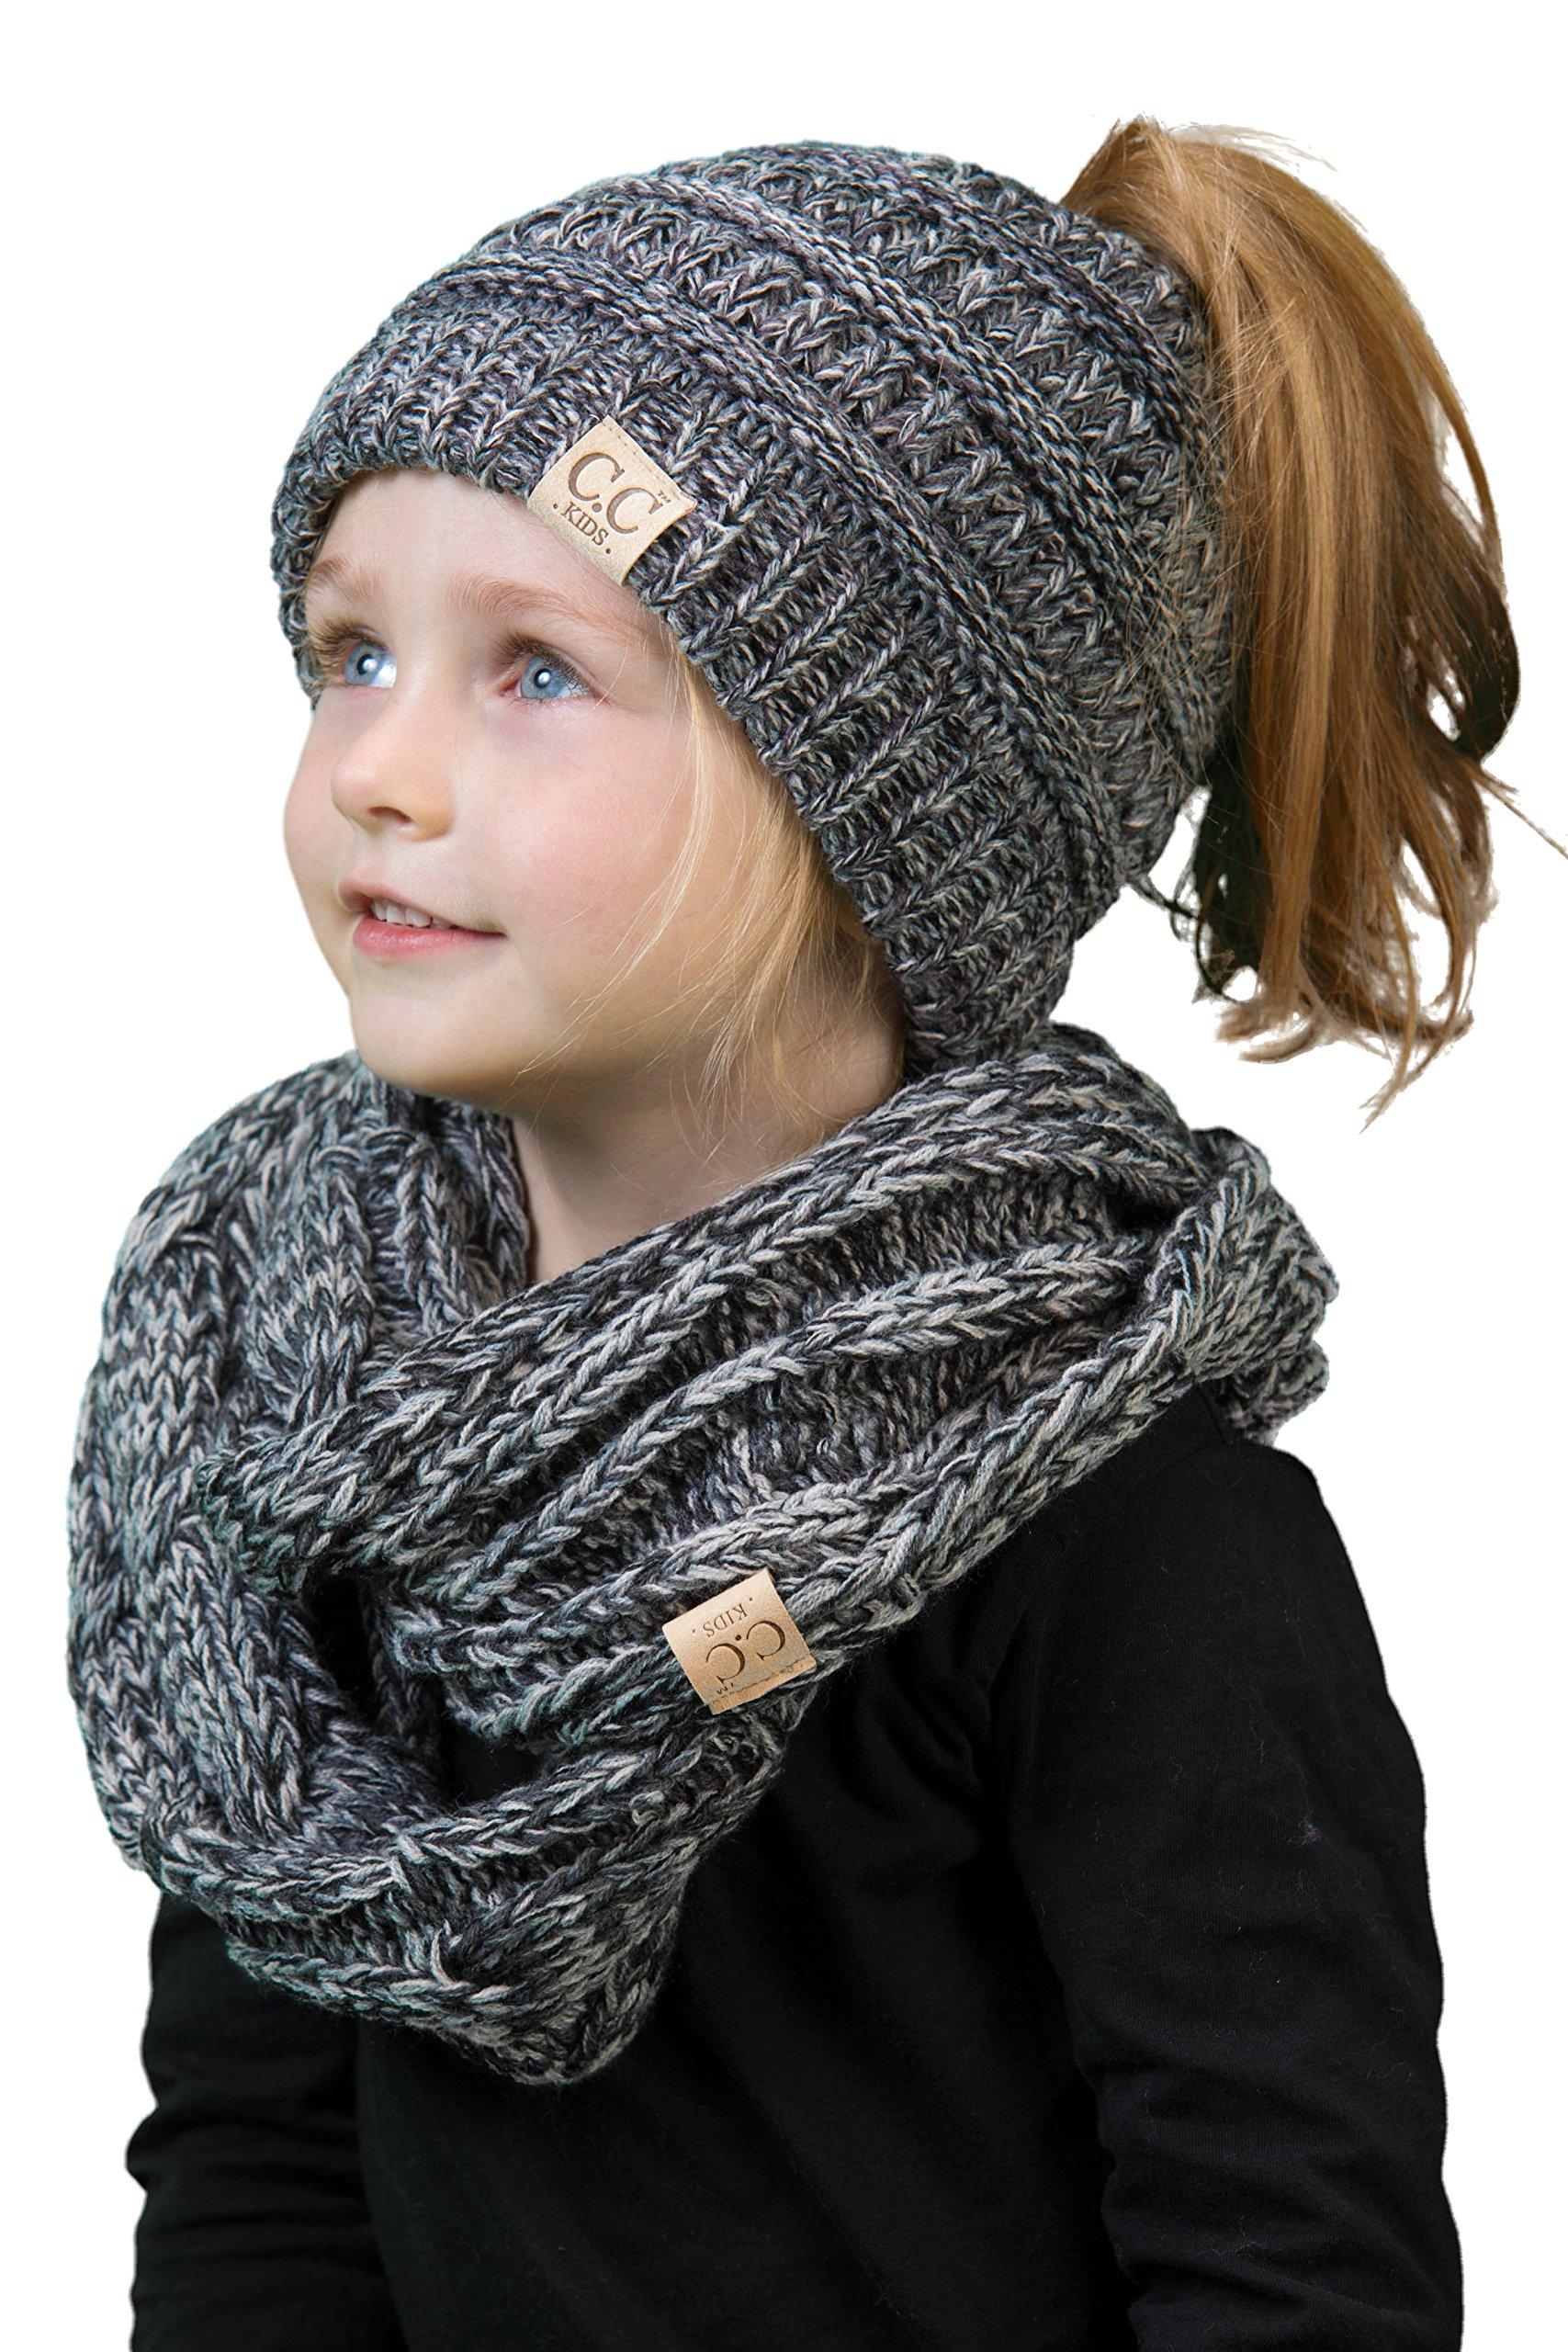 K1-BT2-816.21 Kids Scarf & Beanie Tail Matching Bundle Set- Grey/Black 4#31